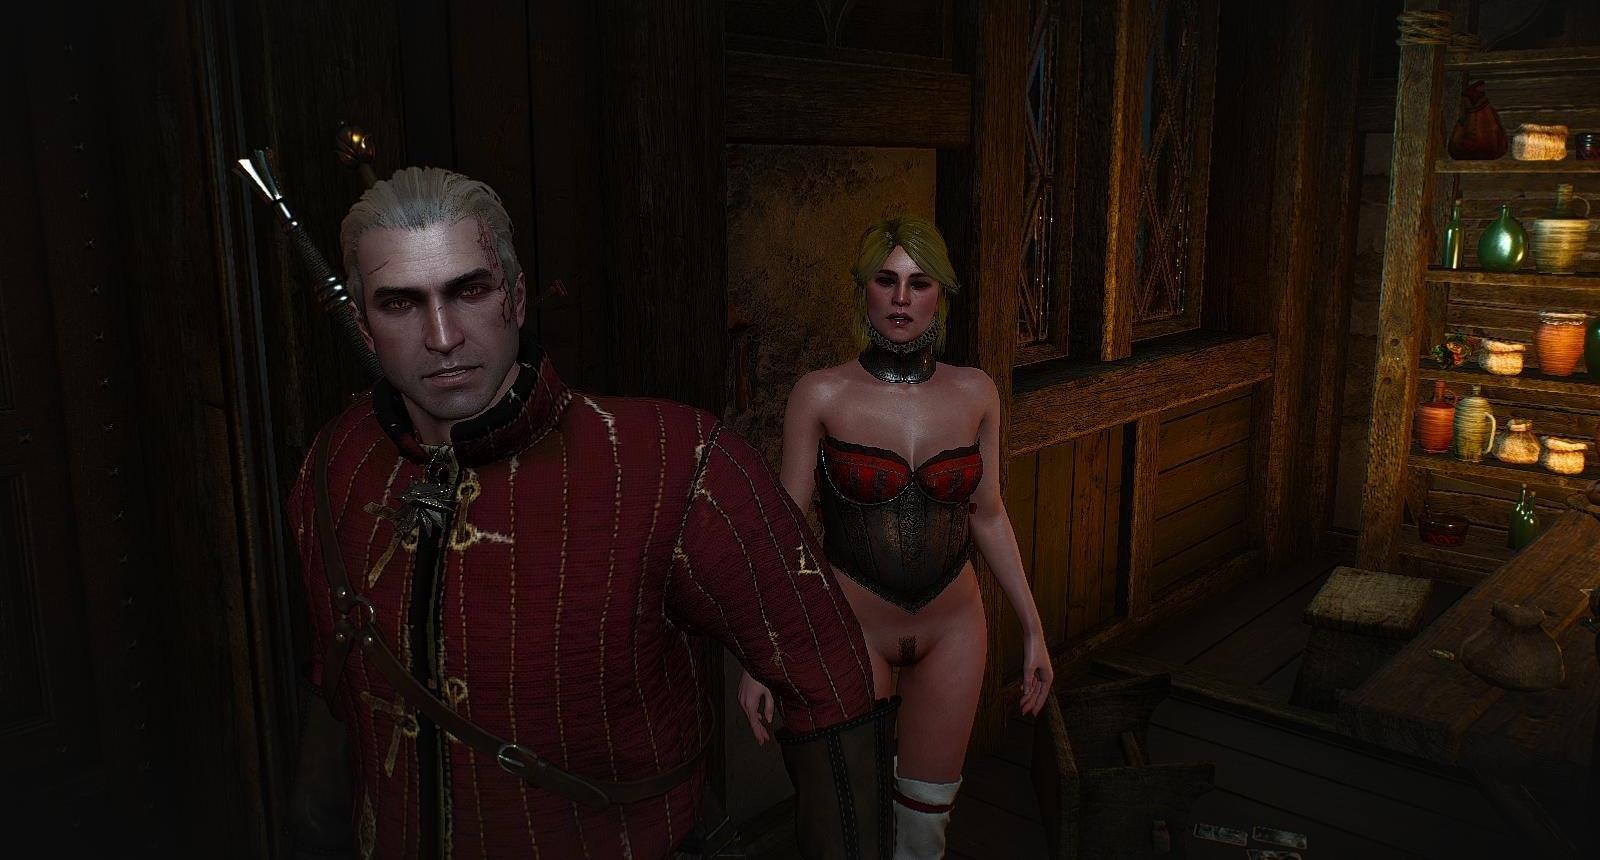 Ведьмак зашёл к Лютику, а у него - голые бабы! ))